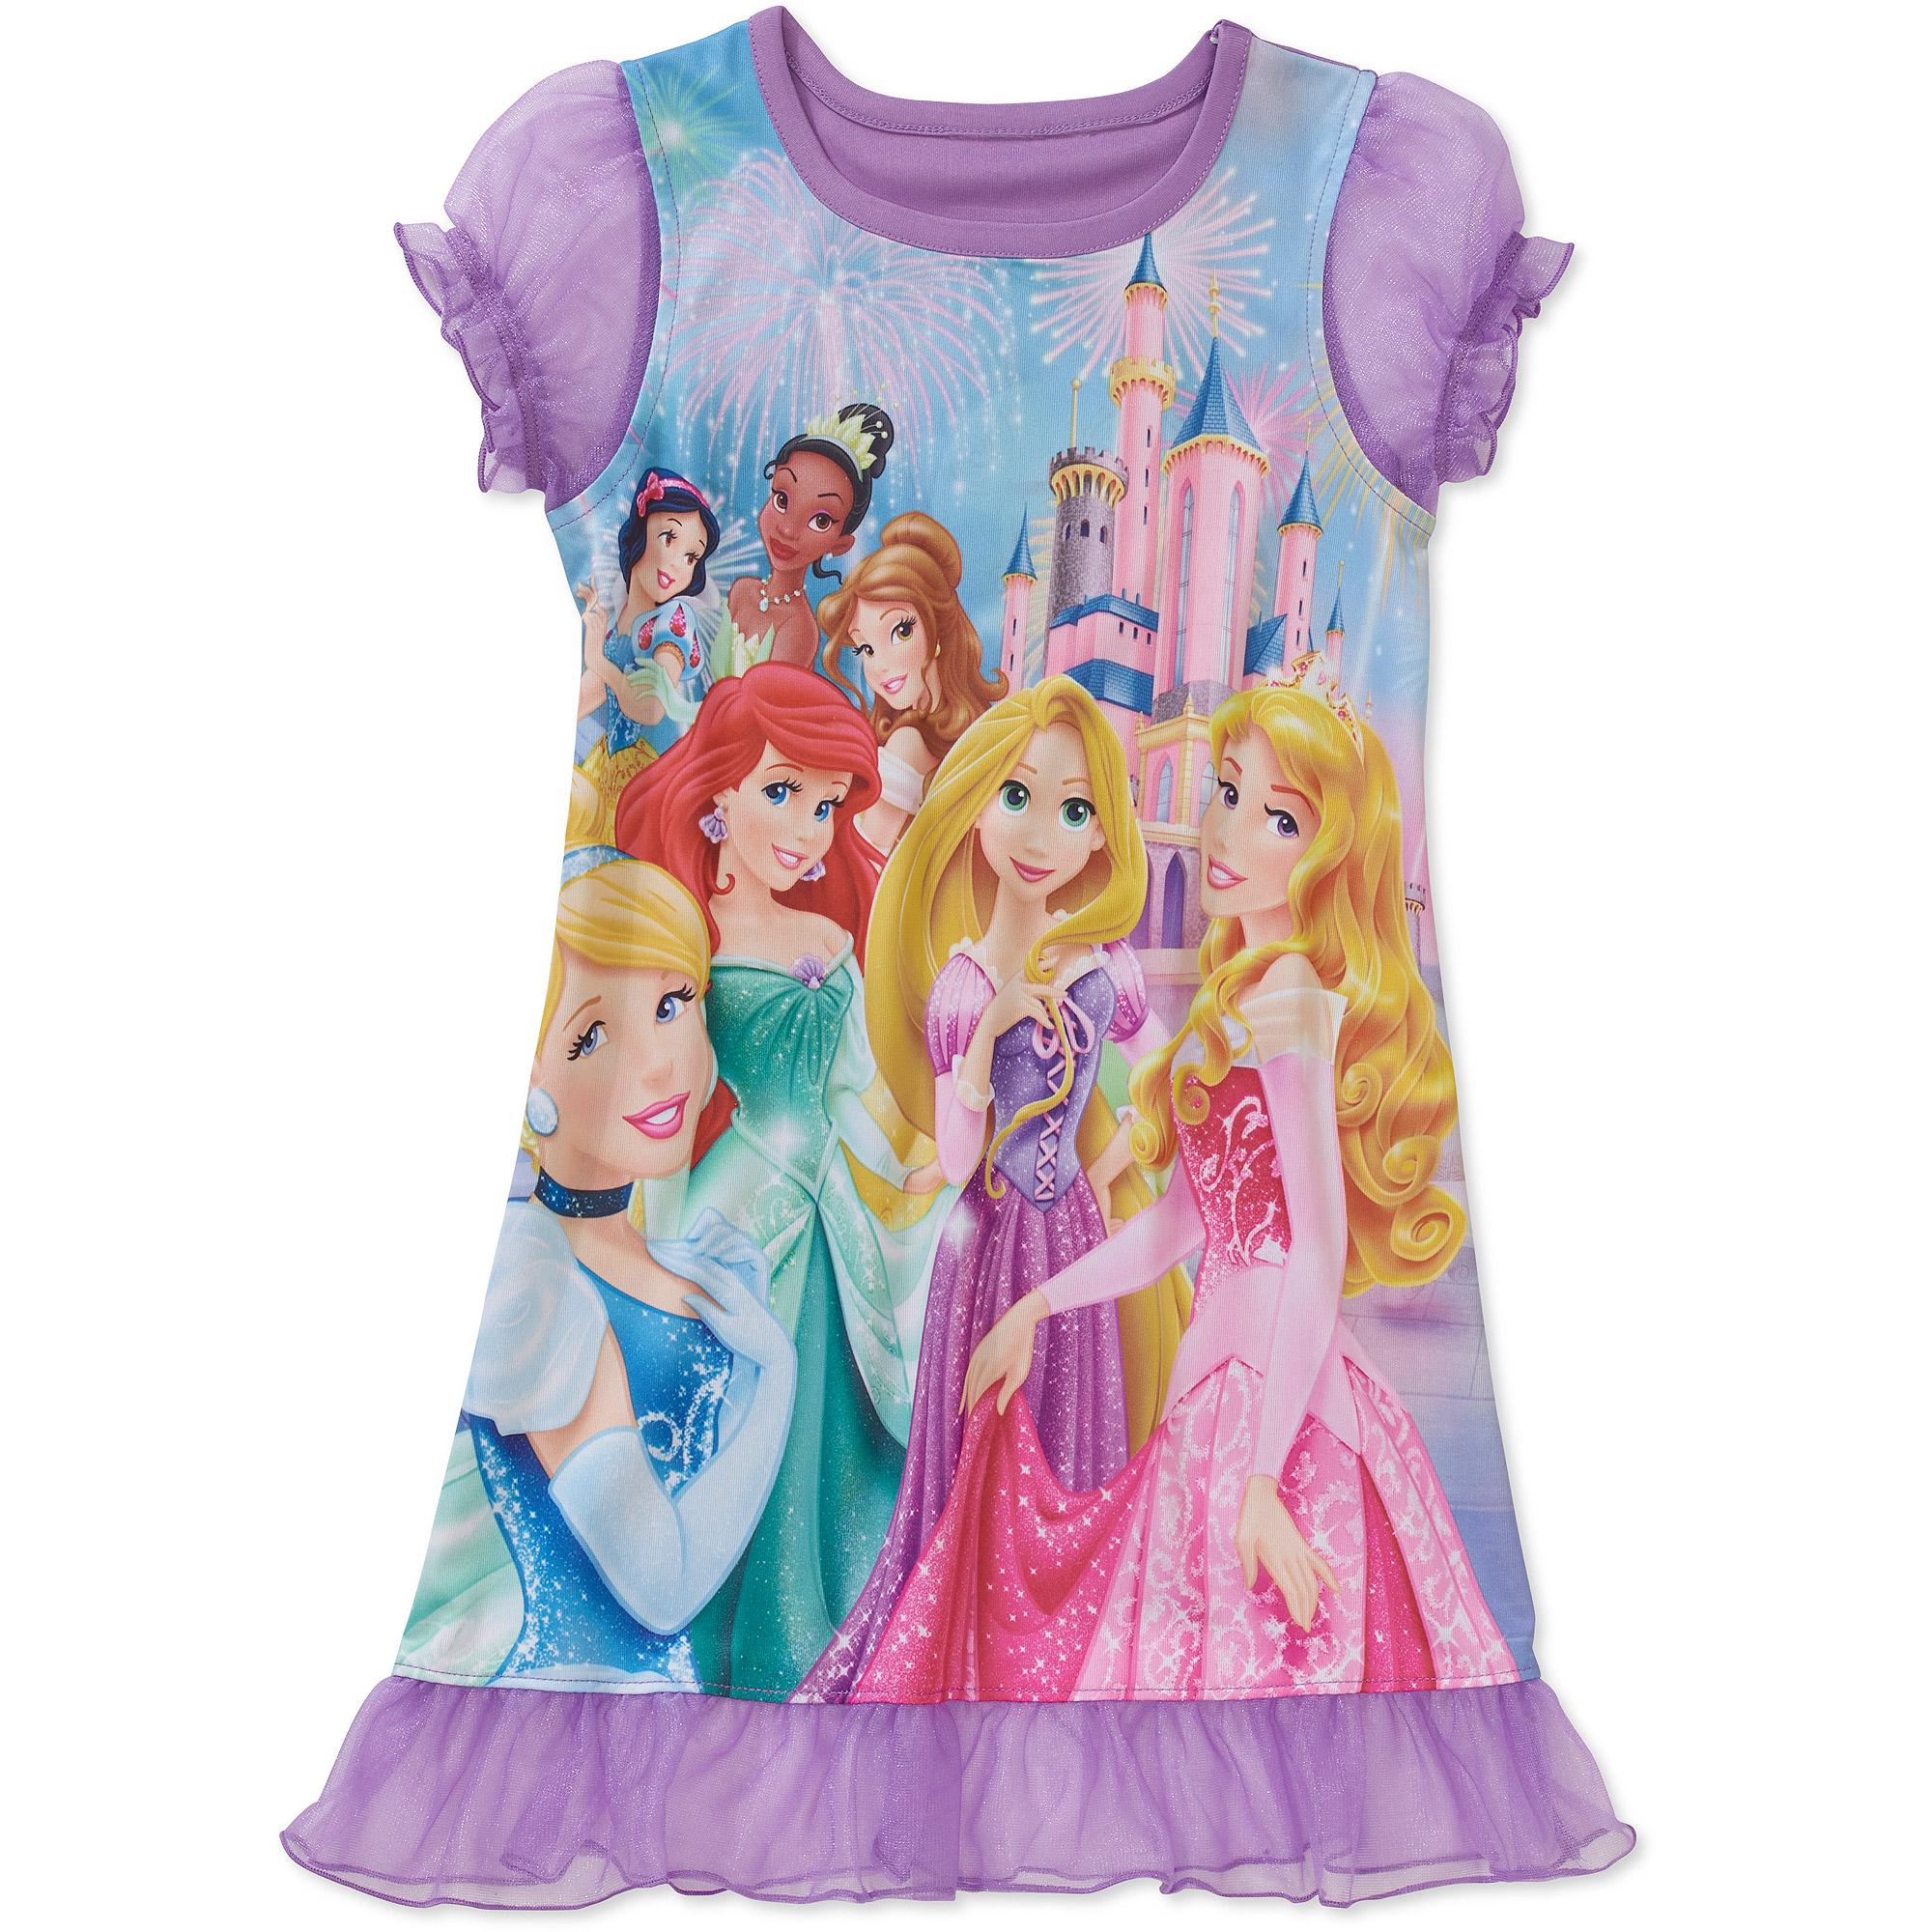 Disney Princesses Baby Toddler Girl Short Sleeve Night Gown